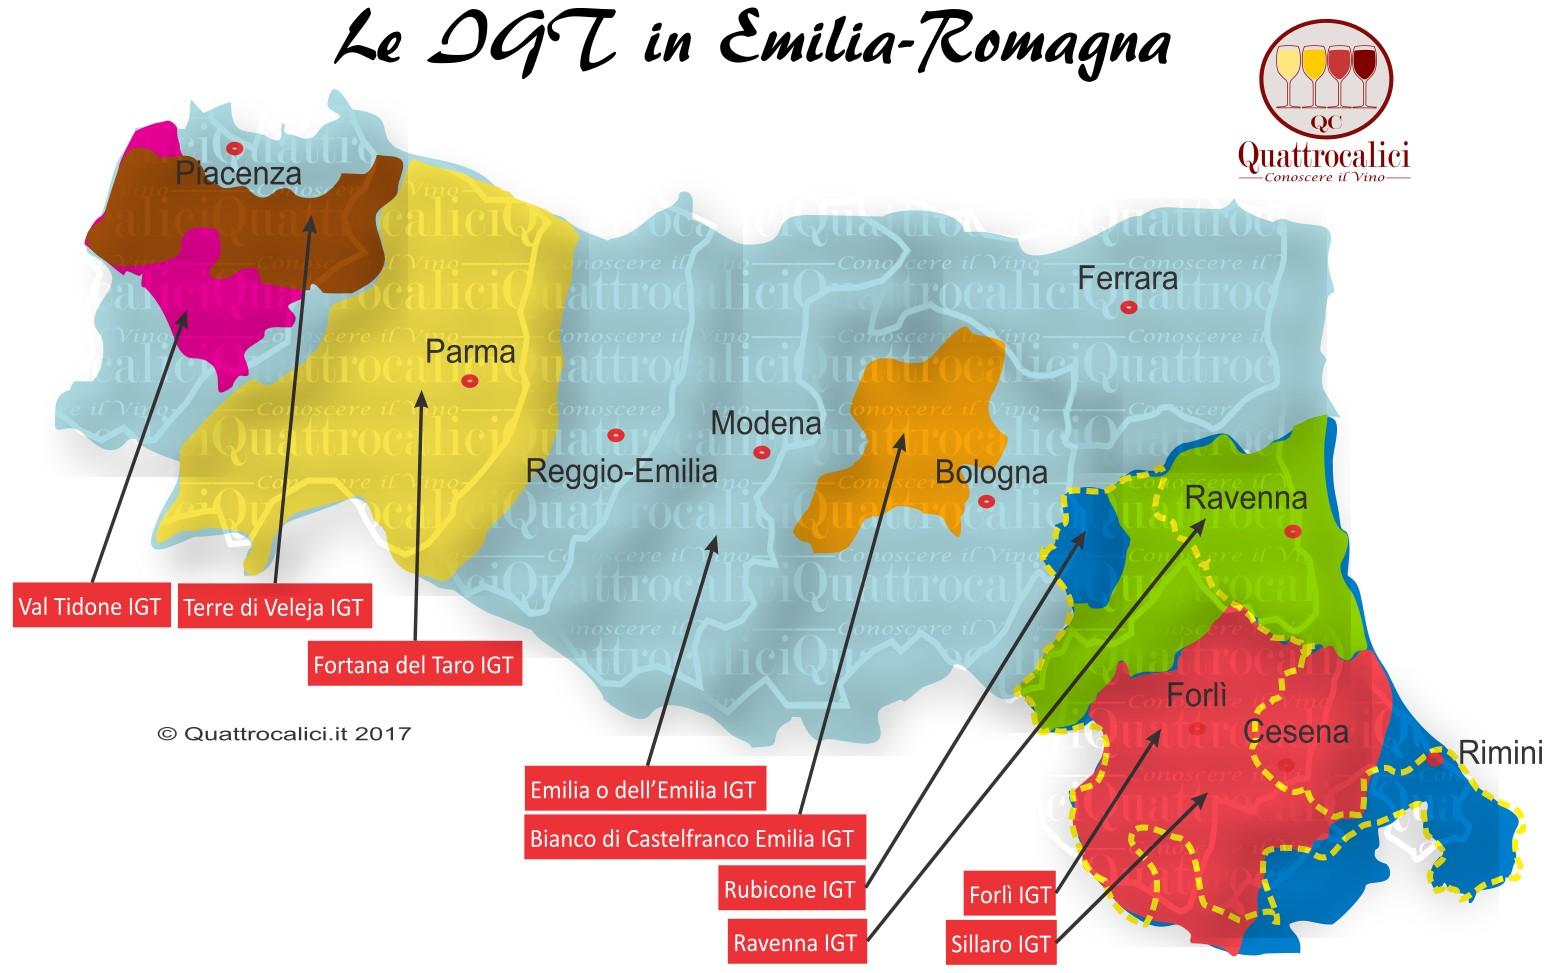 Le IGT dell'Emilia-Romagna